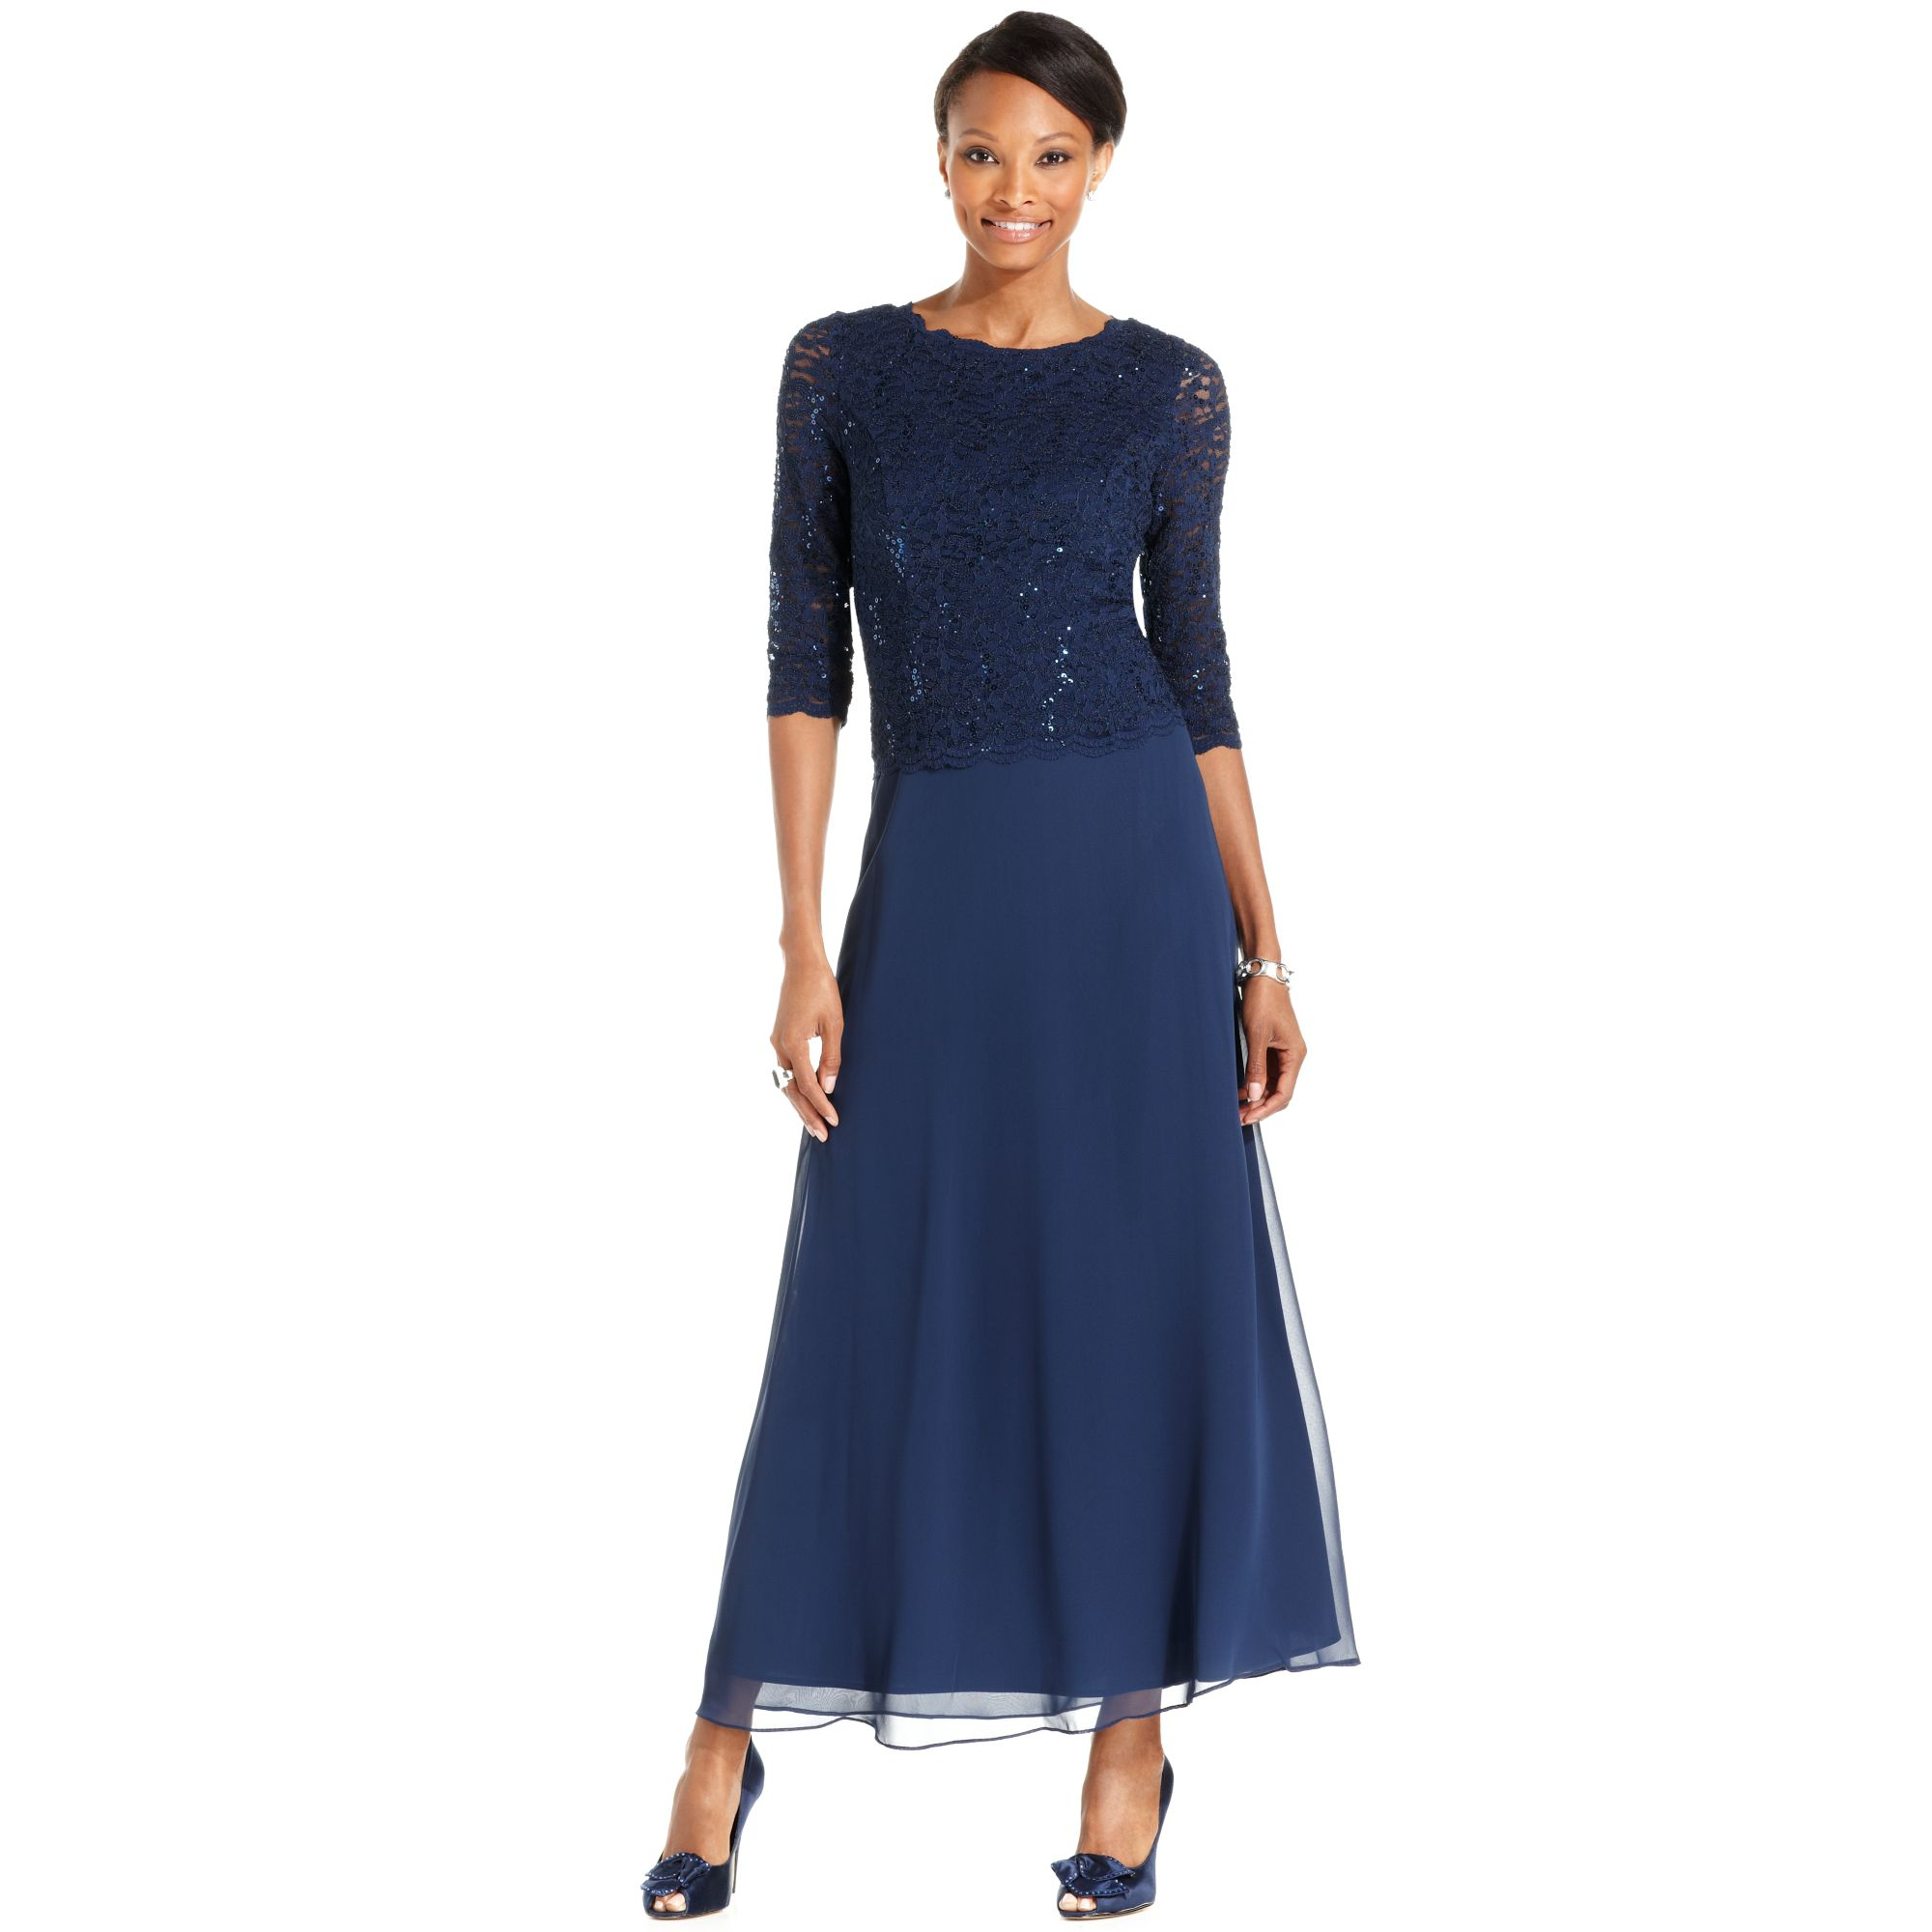 Macys Navy Blue Dresses: Alex Evenings Petite Elbow-sleeve Sequin Lace Gown In Blue